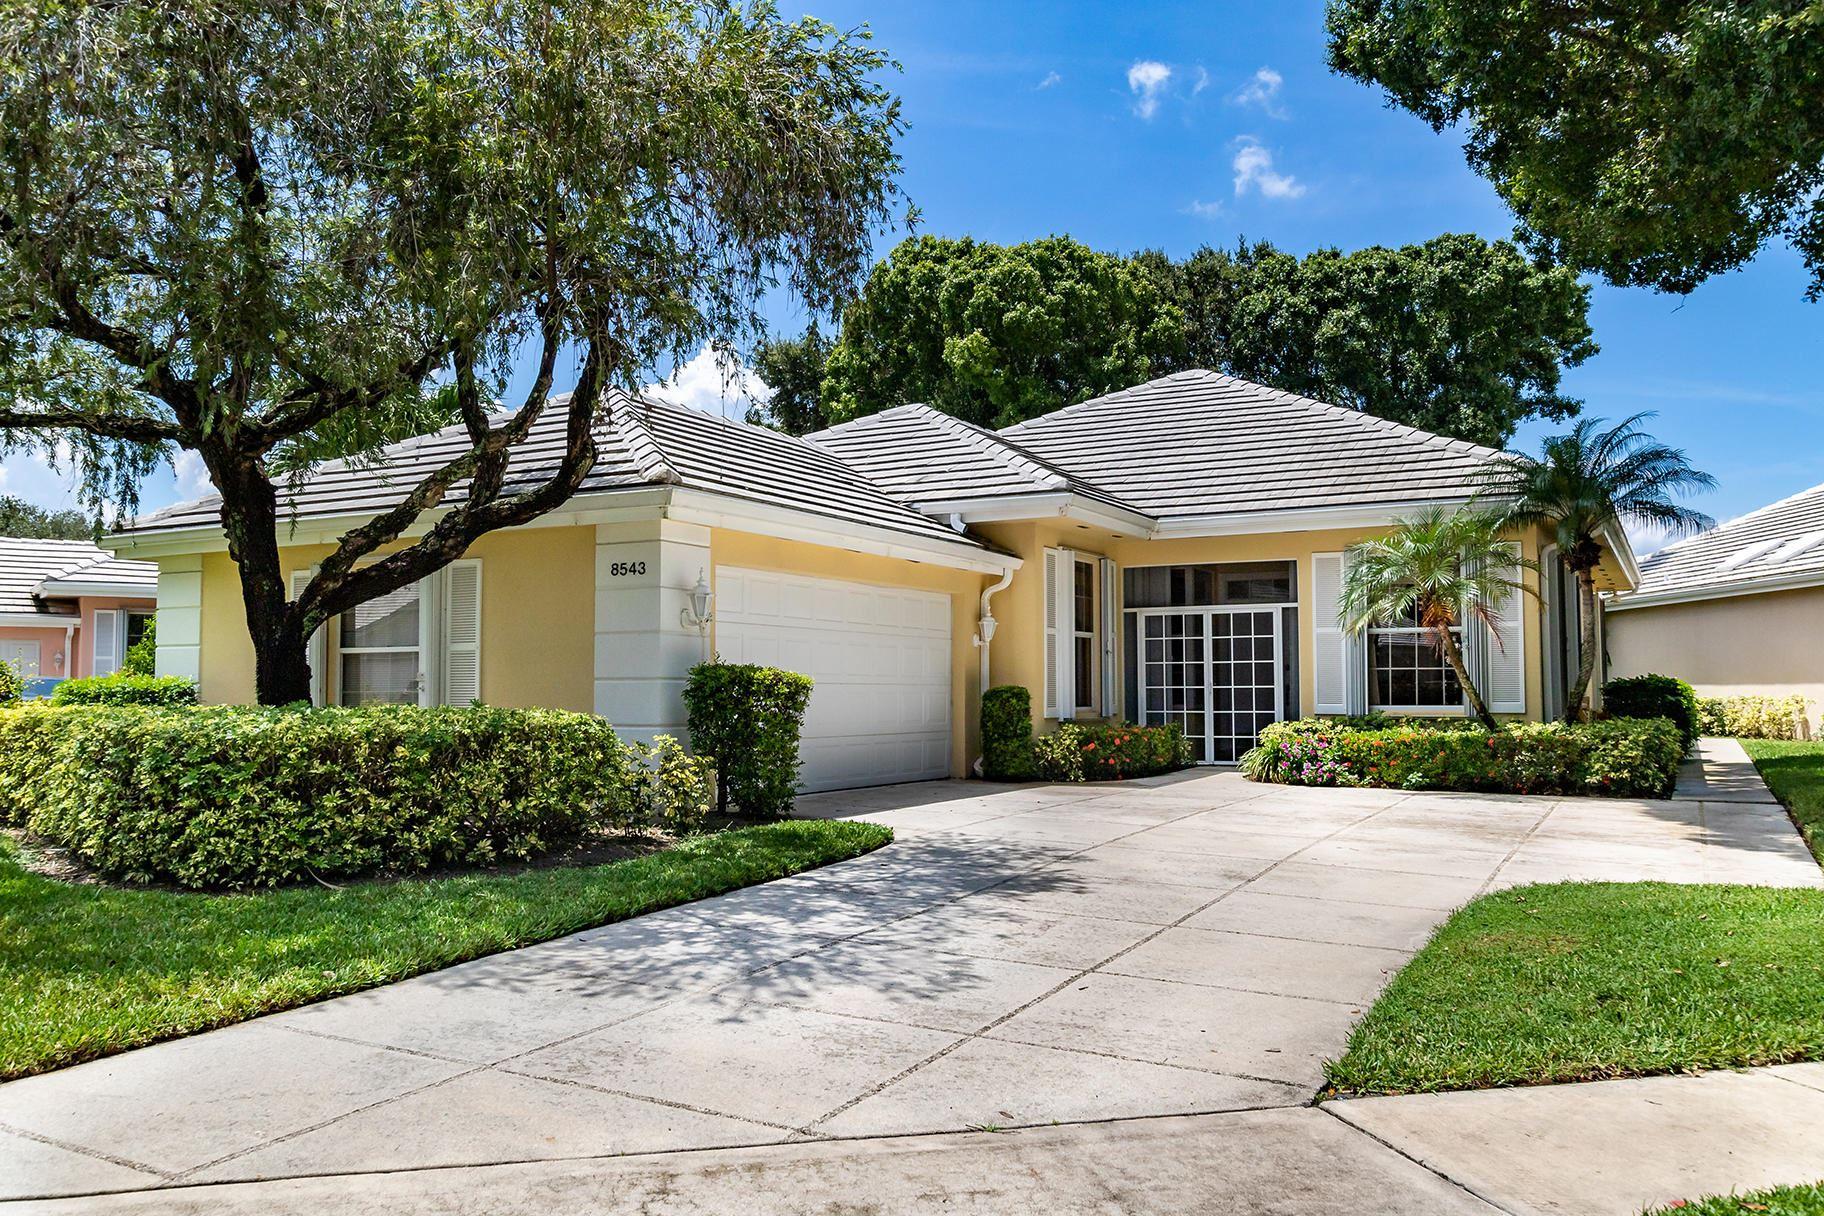 Photo of 8543 Doverbrook Drive, Palm Beach Gardens, FL 33410 (MLS # RX-10645271)